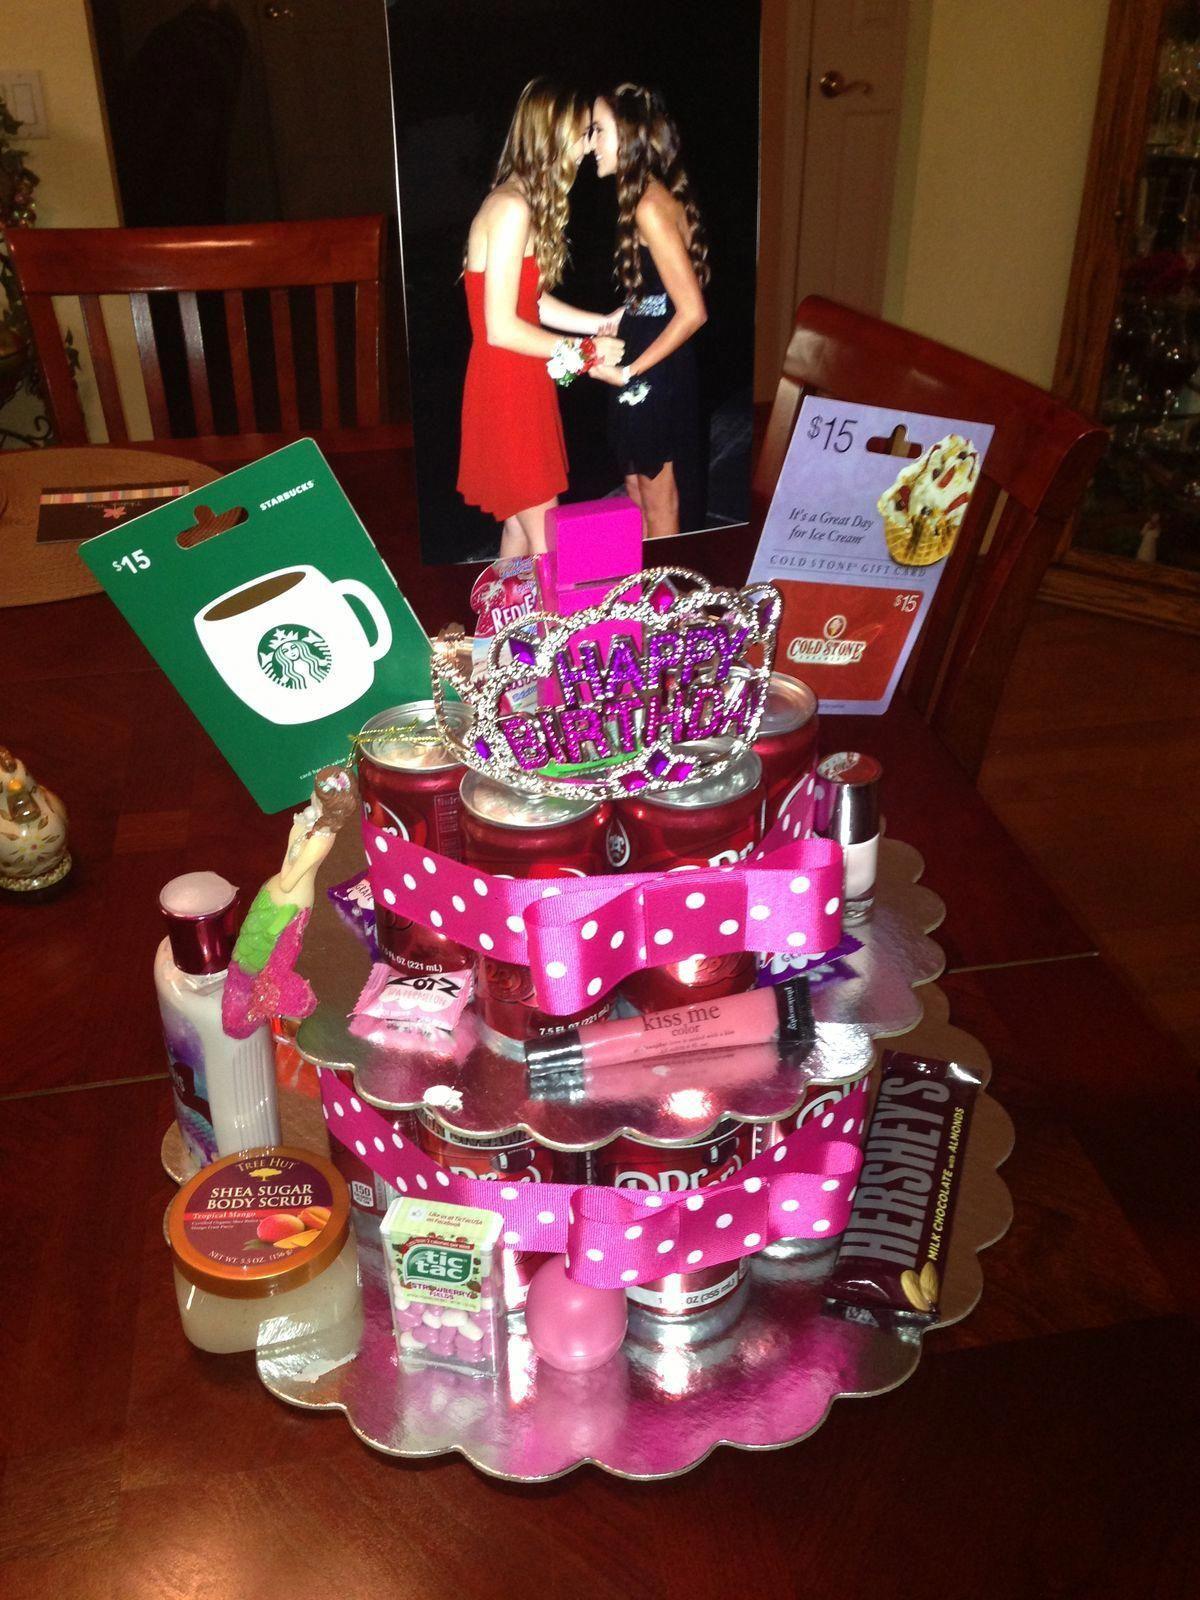 Diy best friend gifts 18th birthday